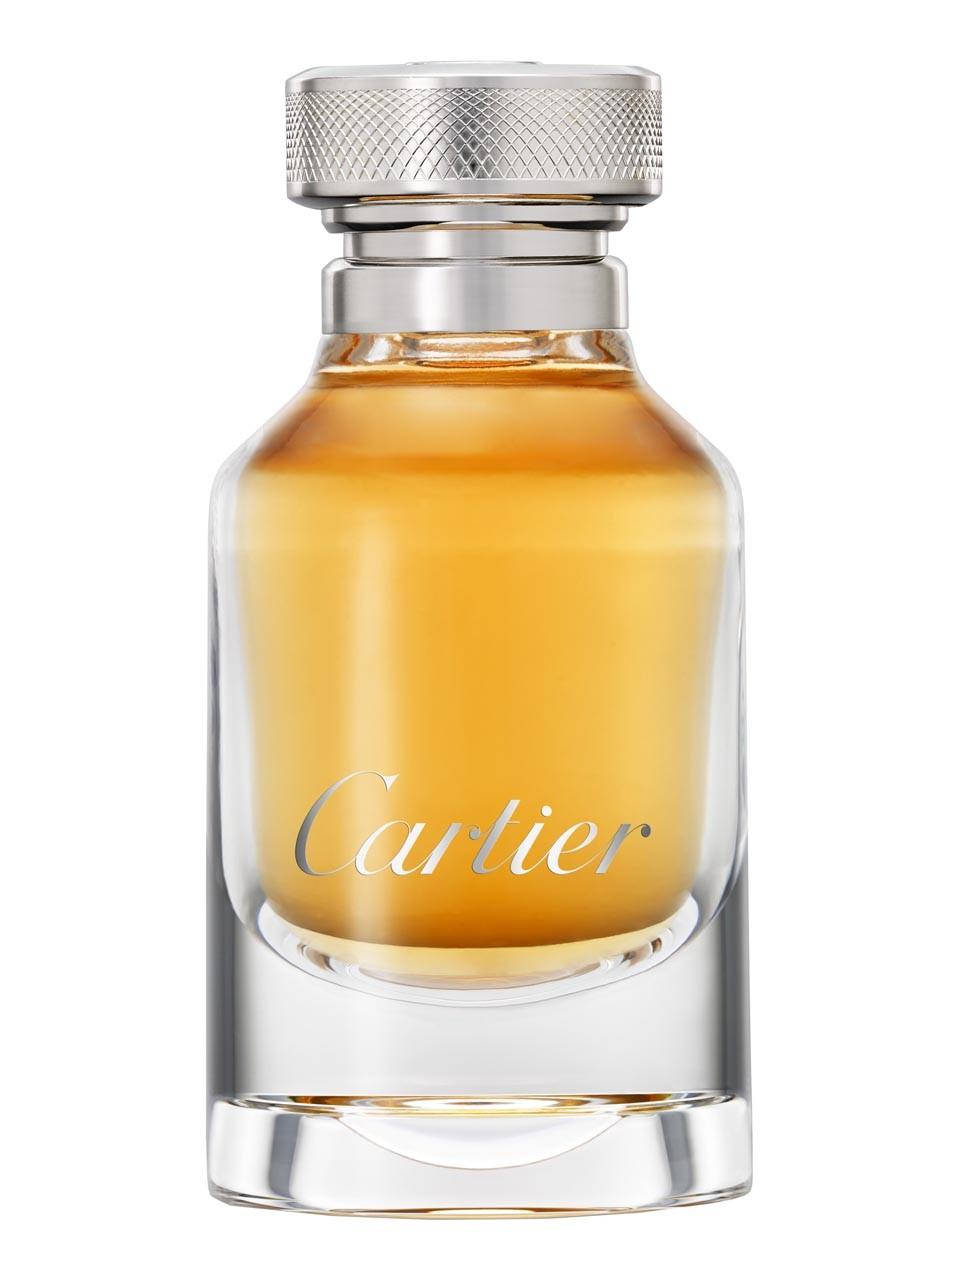 b620ffe4f L'Envol de Cartier Eau de Parfum Cartier ماء كولونيا - a fragrance ...